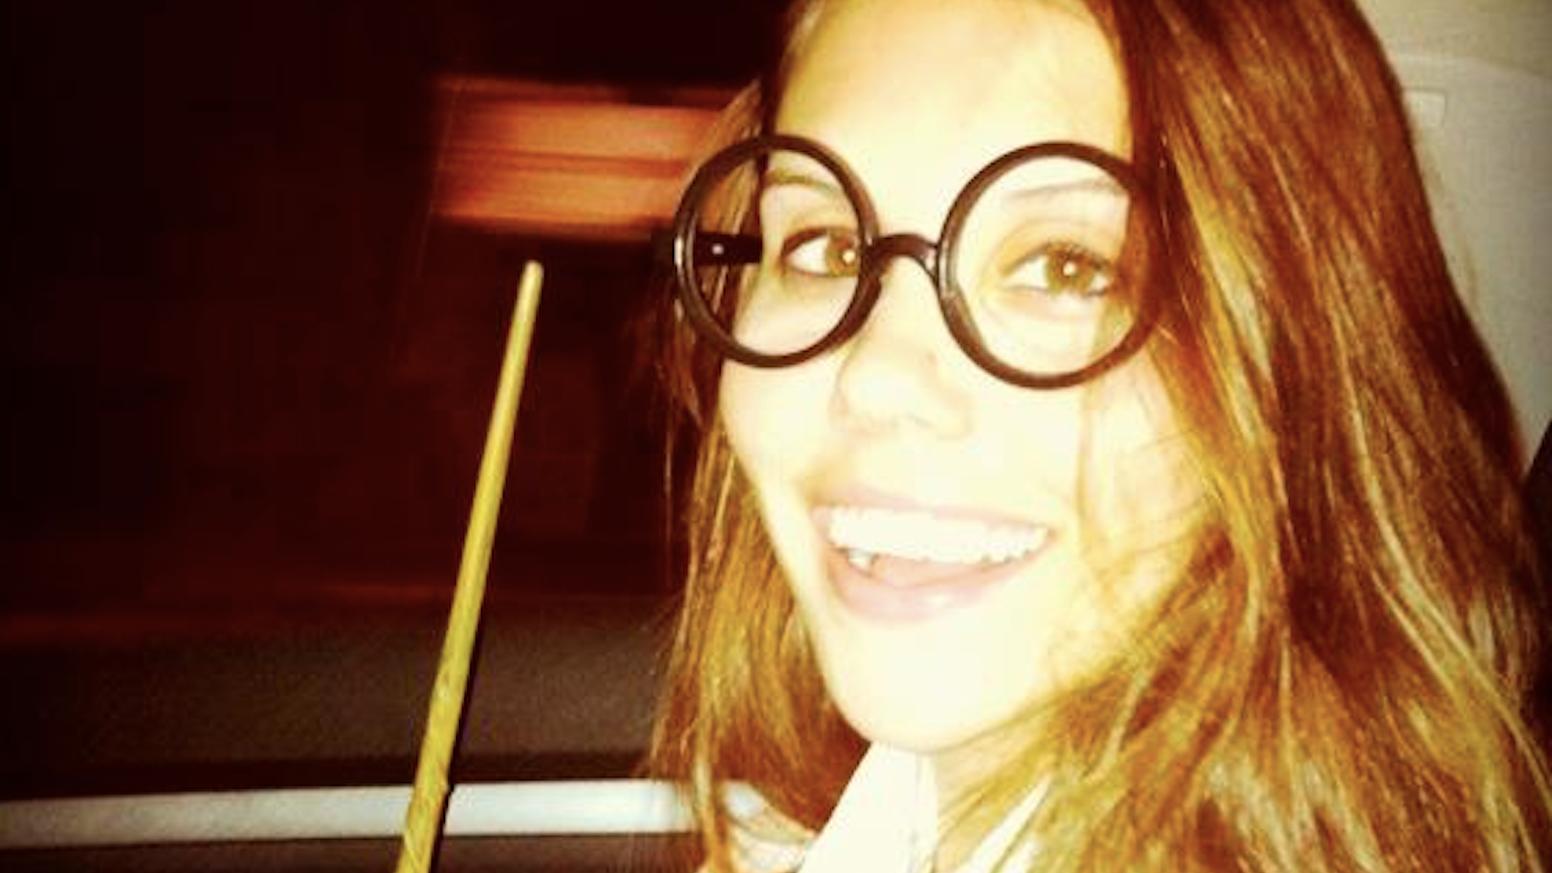 98a8e926a72 Harry Potter Music Video - Weasley Sweaters by Kate — Kickstarter